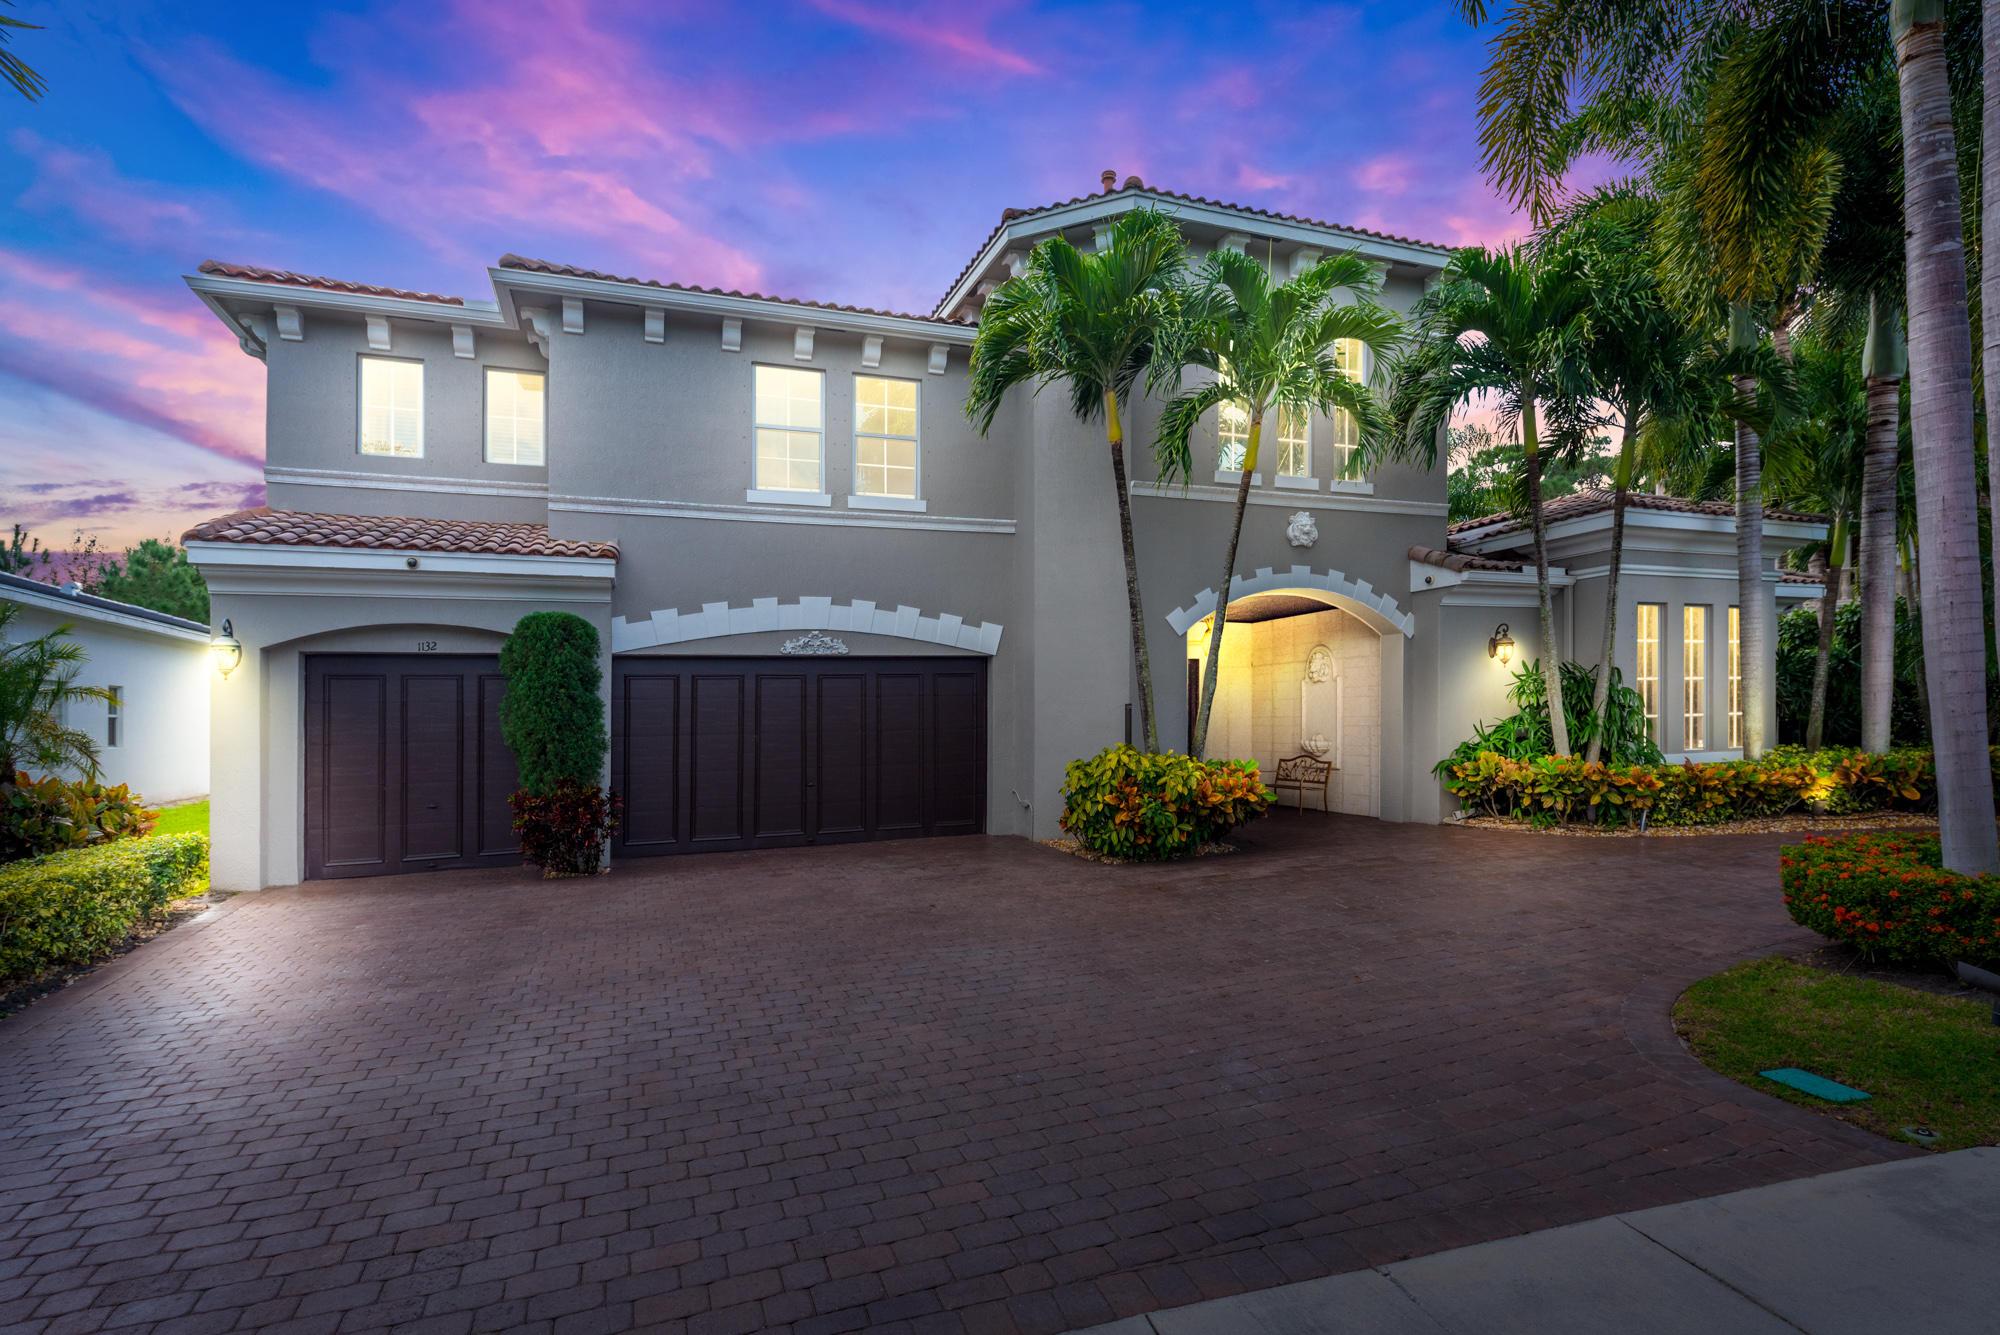 Details for 1132 San Michele Way, Palm Beach Gardens, FL 33418